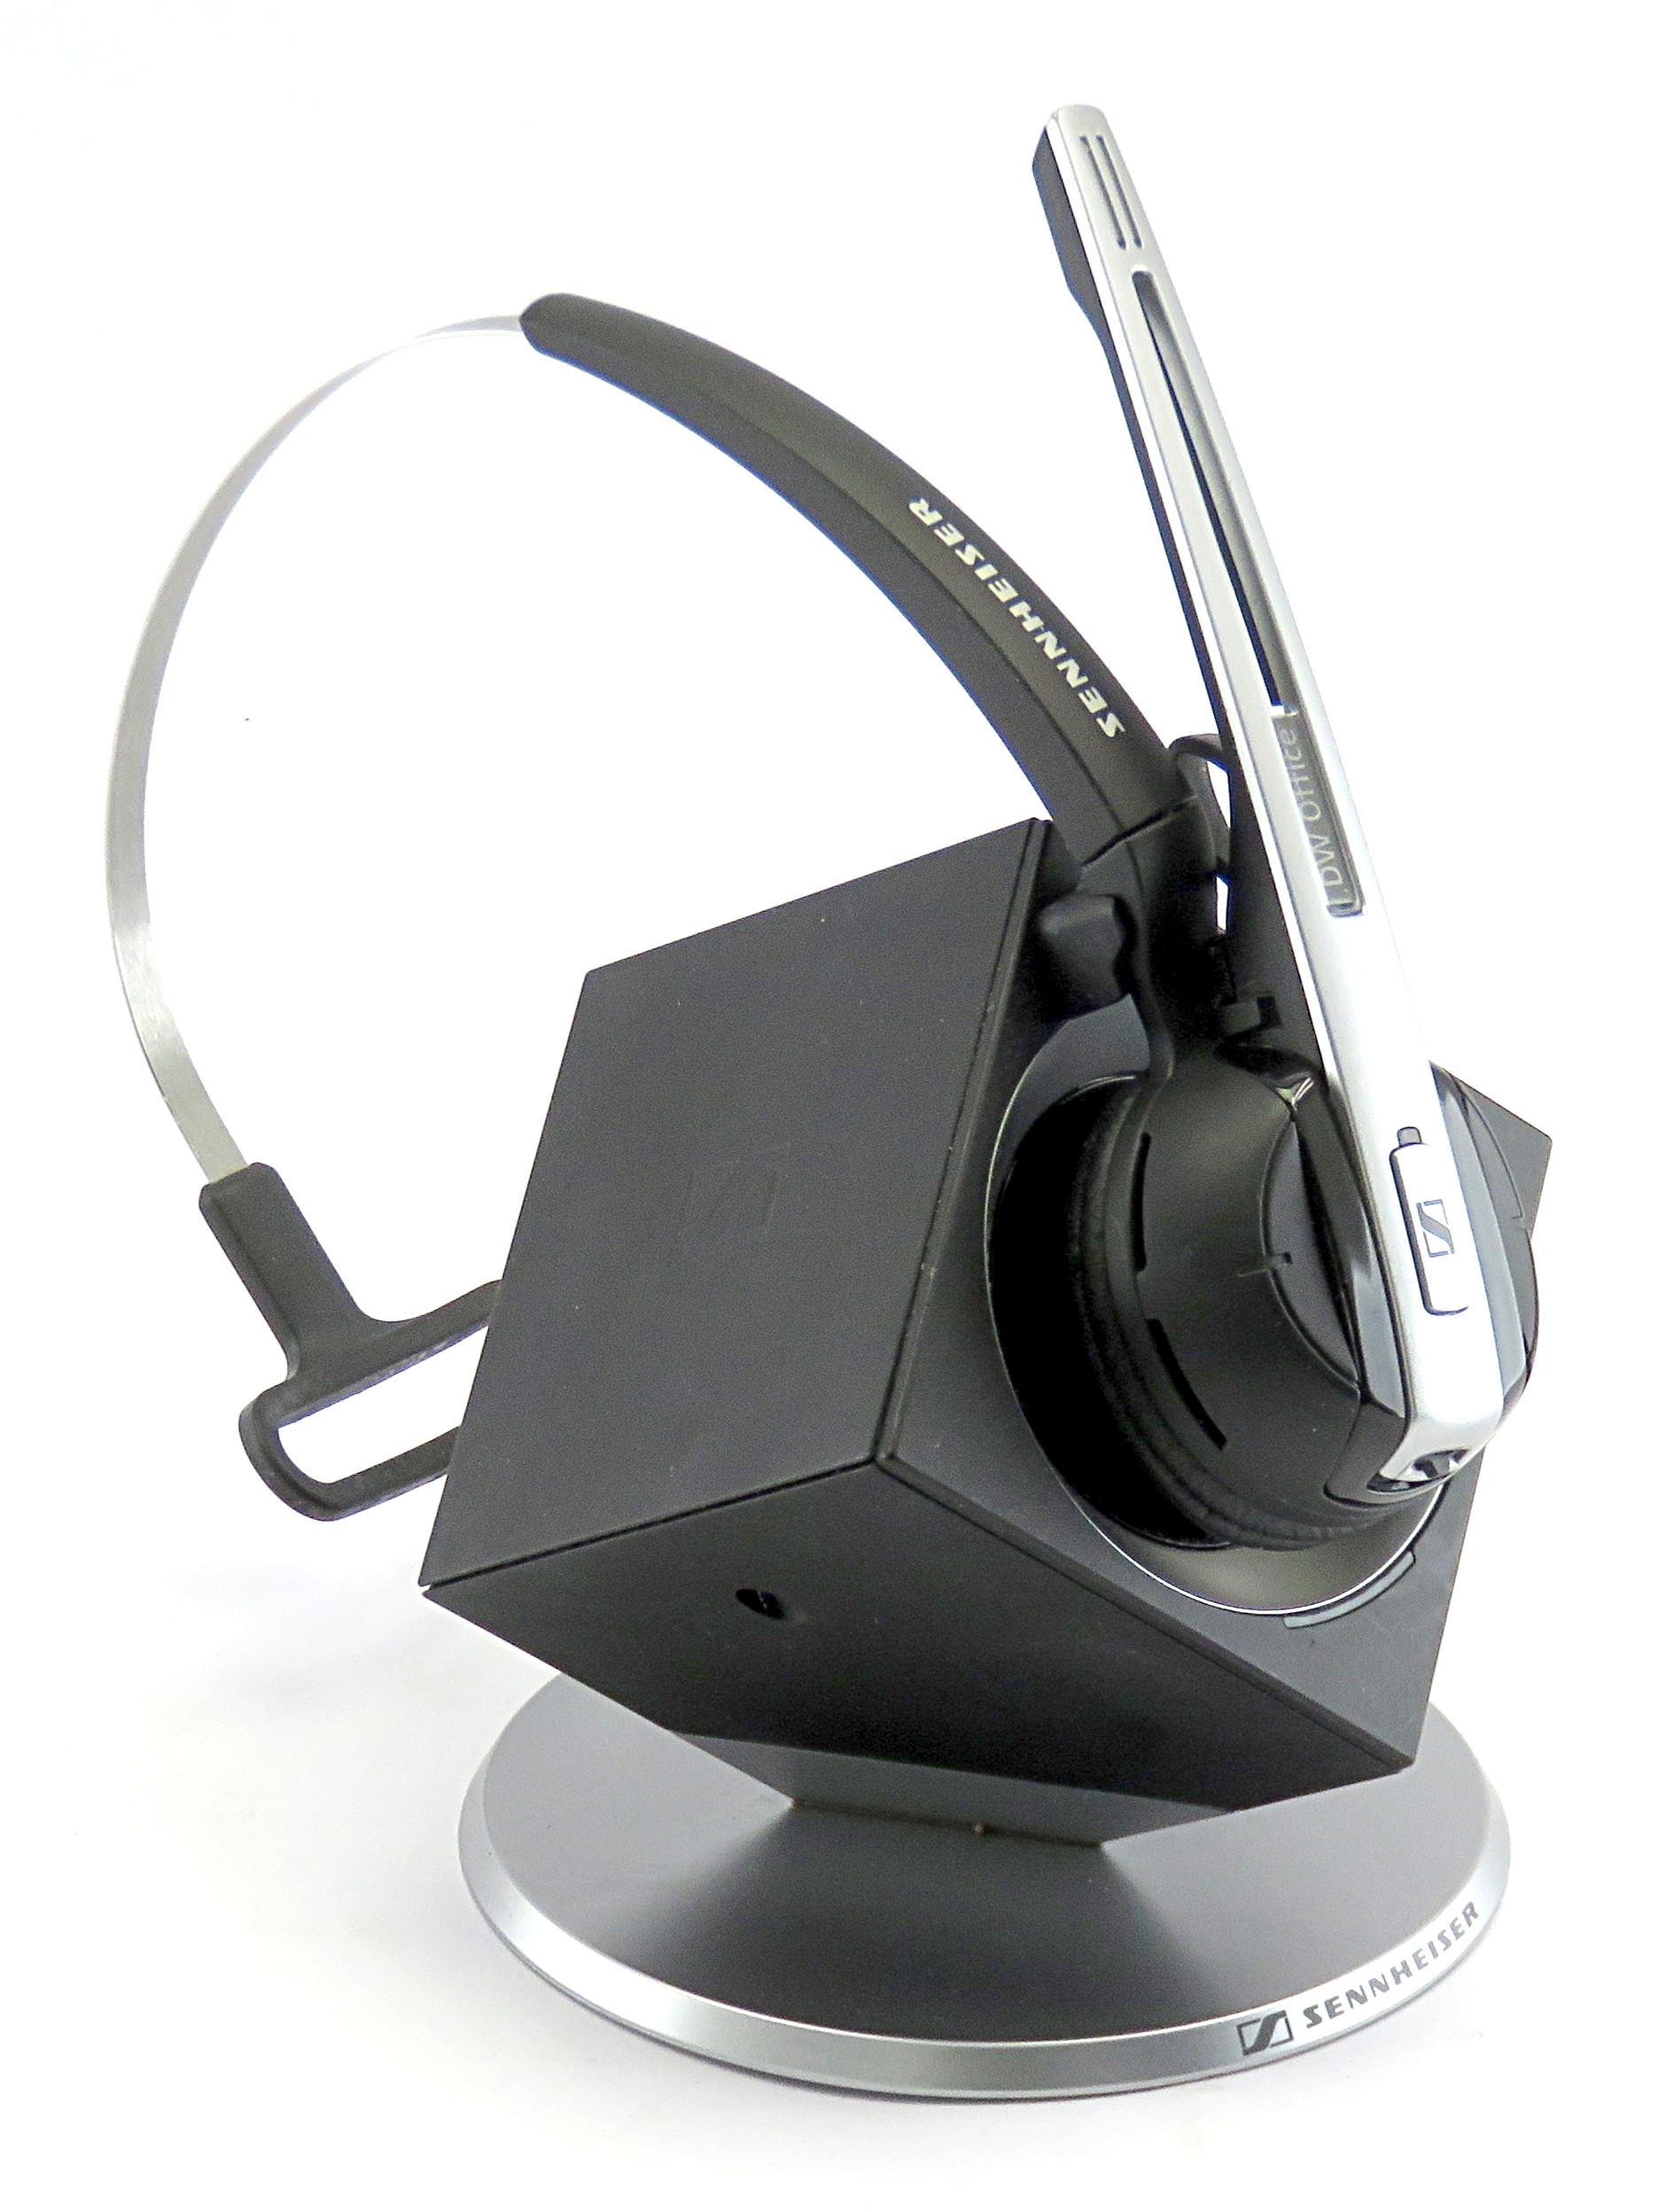 Sennheiser DW Office DECT Telephony Wireless Headset System, No PSU